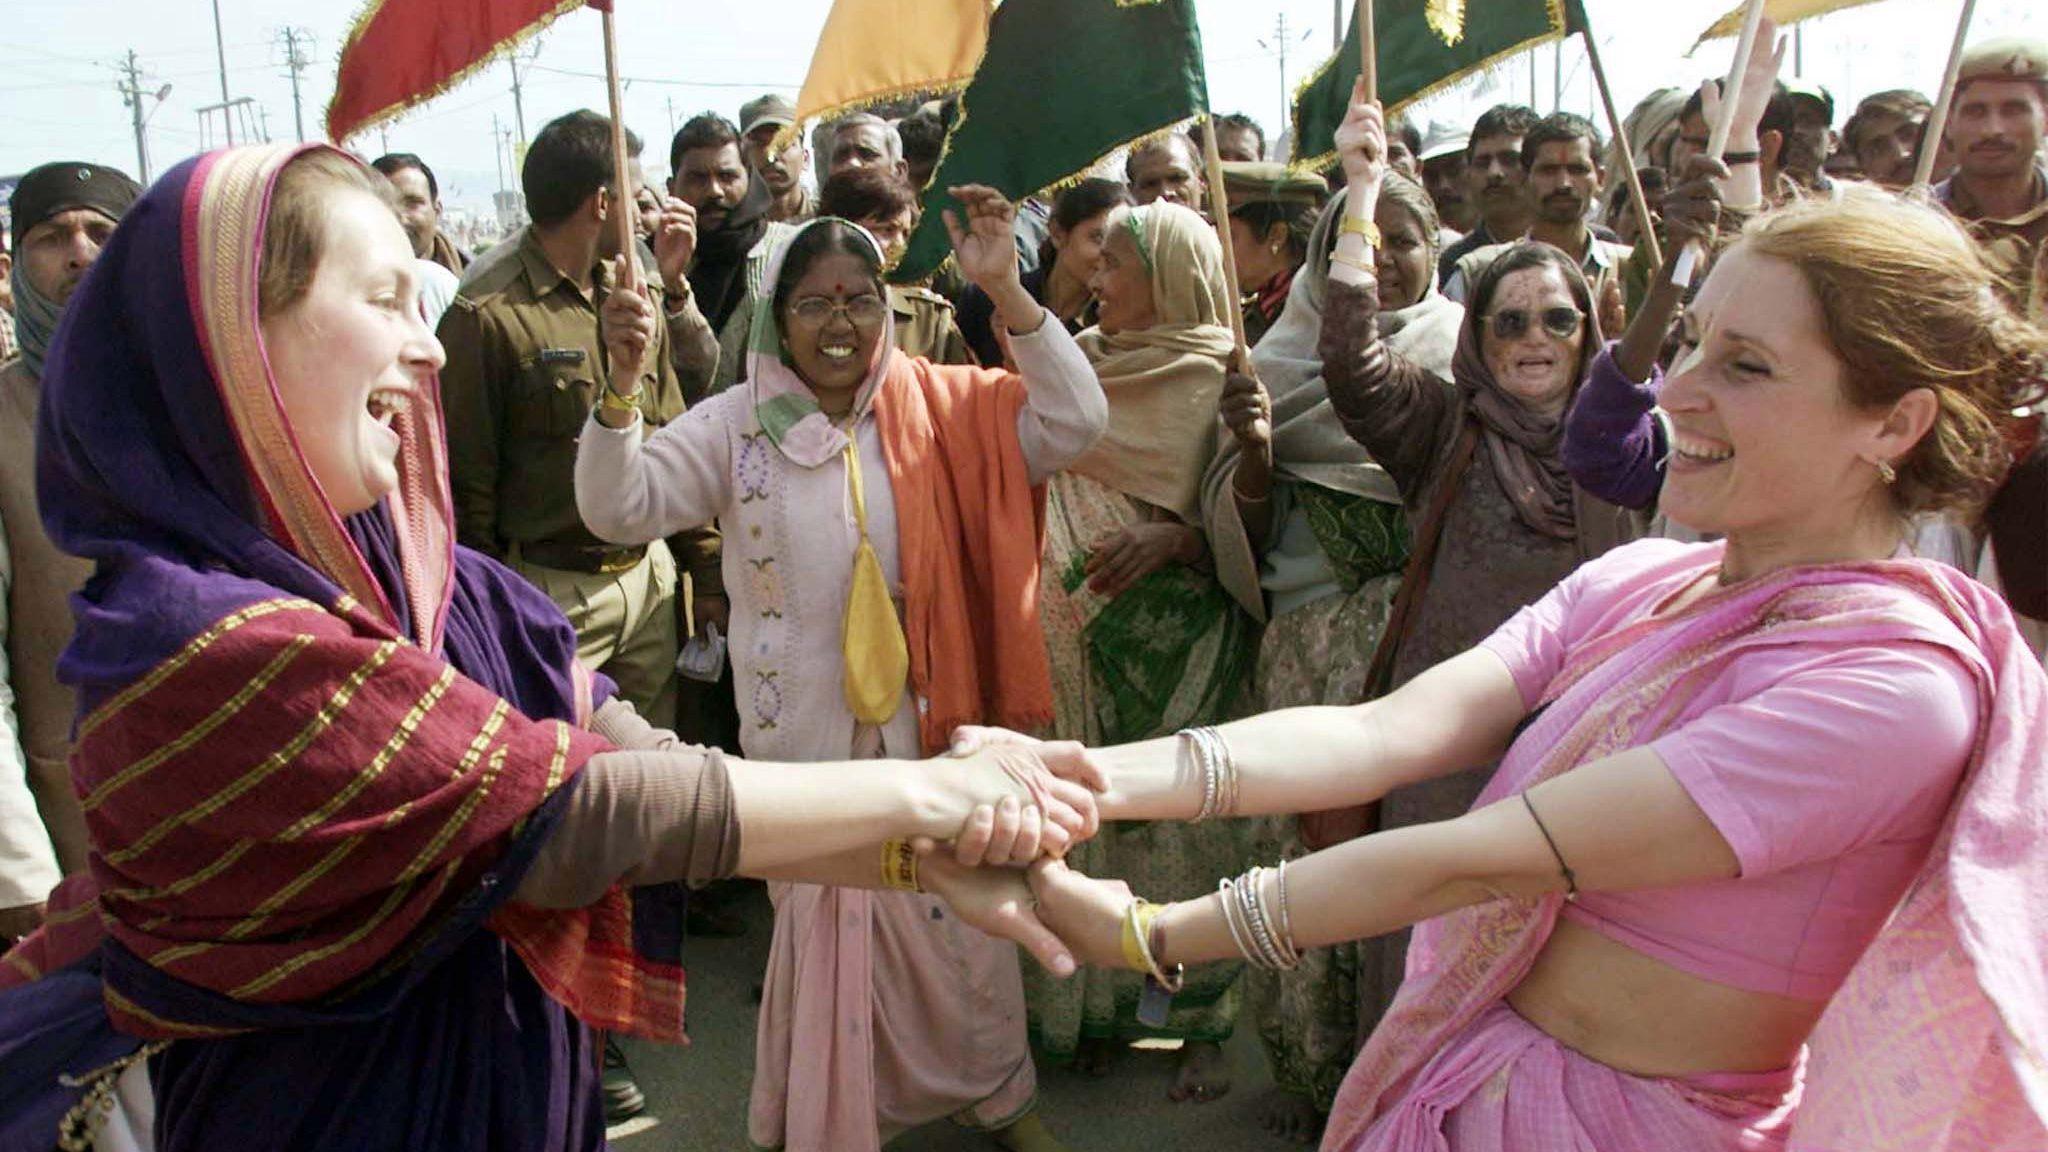 Bhakti Fest symbolises America's Hindu spirituality obsession